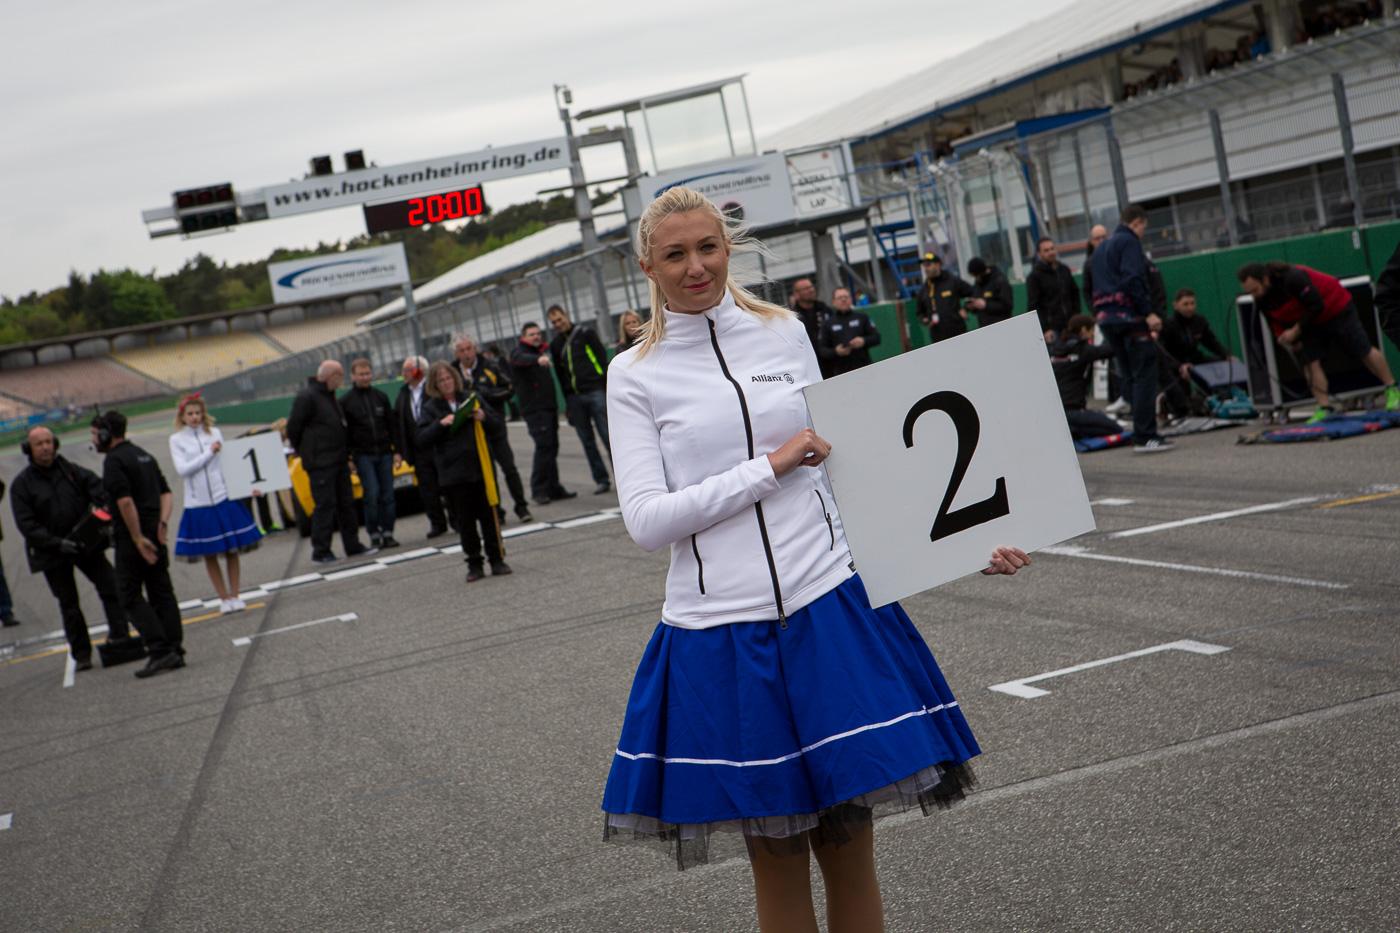 Starting grid for race 2 in Hockenheim is set.